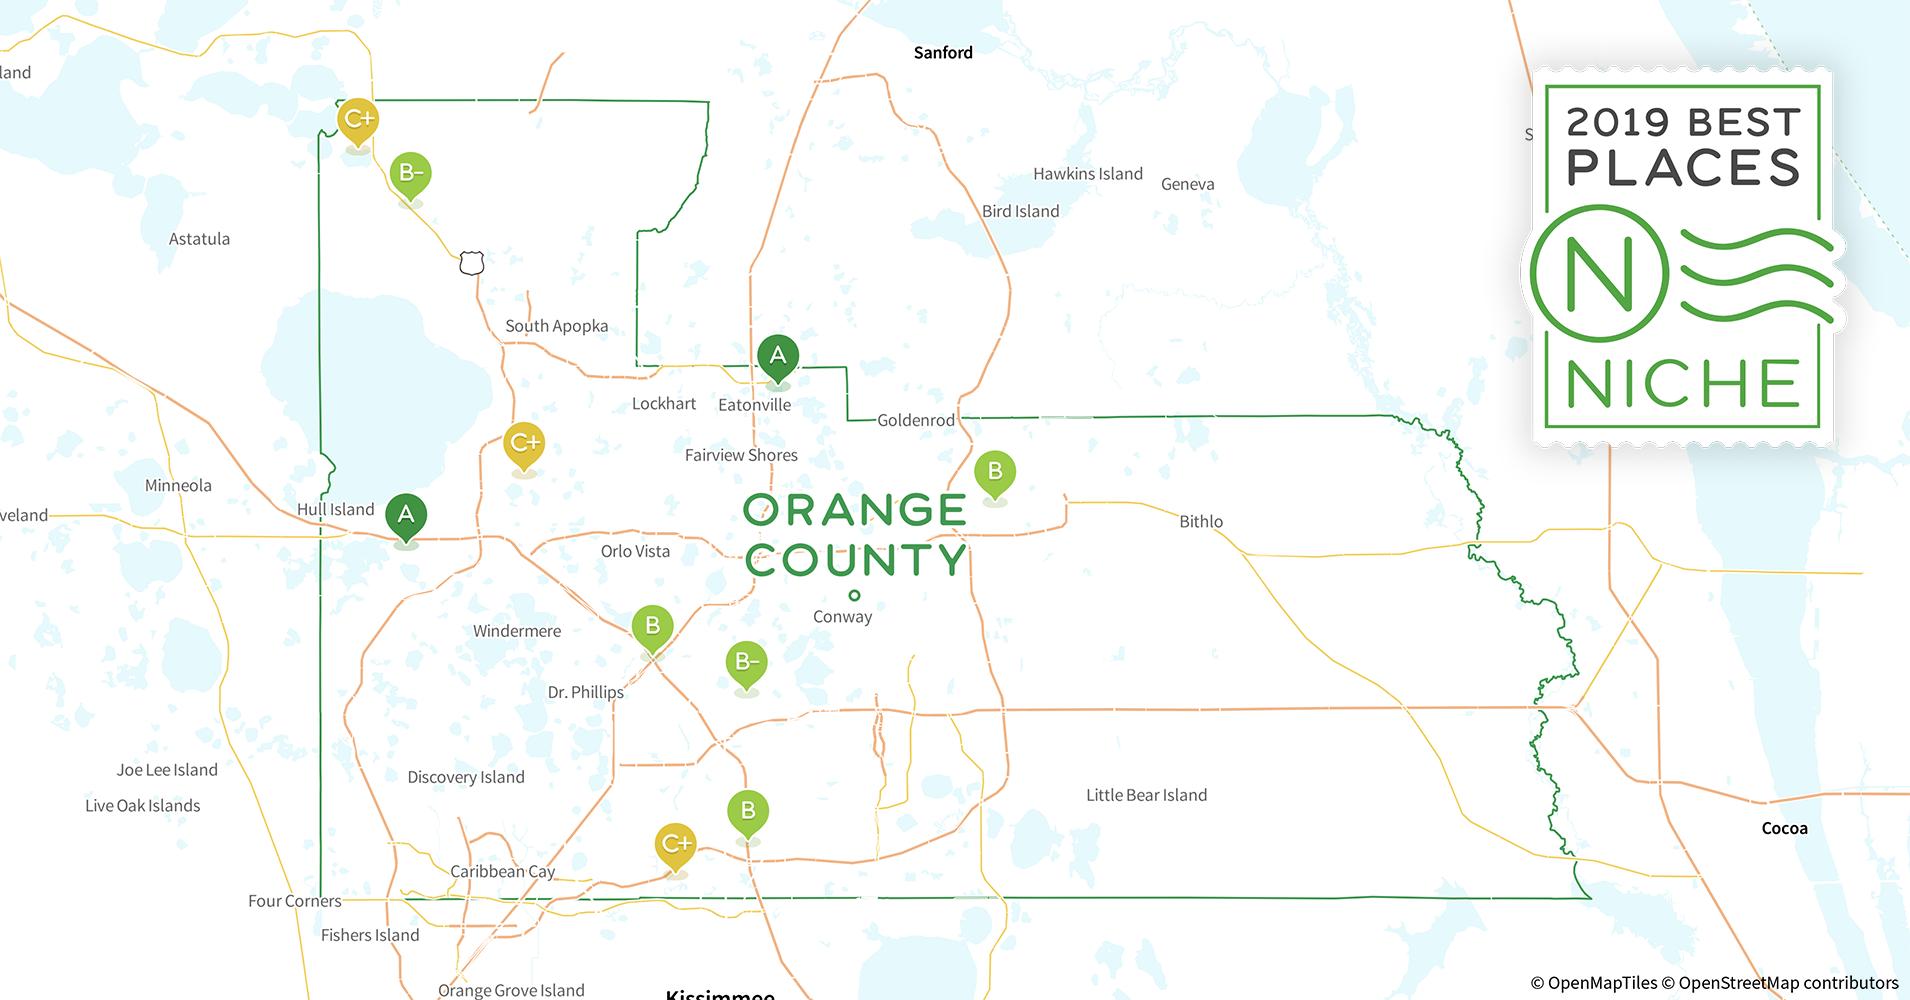 2019 Best Places to Live in Orange County, FL - Niche Zip Code Map Orange County Fl on orange county fire map, martin county fl zip code map, orange co fl map, lake county fl zip code map, orange county nc zip codes, orange county new york map, orange county zip codes by city, city of port orange map, orange county florida zip codes list, orange county va map, obt orlando fl map, orange county area, clay county fl zip code map, citrus county fl zip code map, lee county fl zip code map, baker county fl zip code map, union county fl zip code map, orange florida map, orange county la county, orange blossom trail orlando fl,